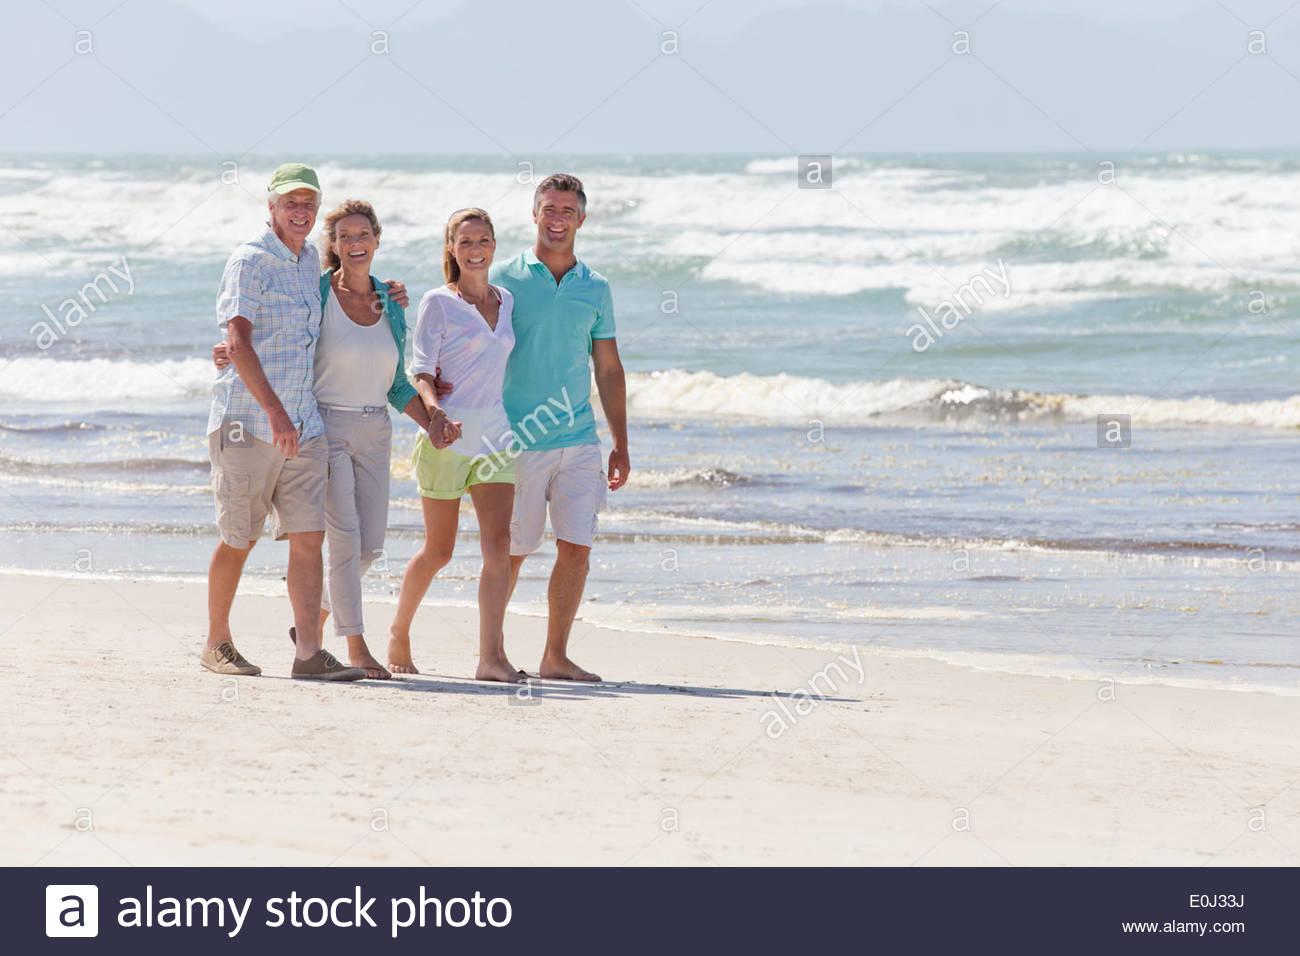 Portrait of happy couples walking on sunny beach Photo Stock